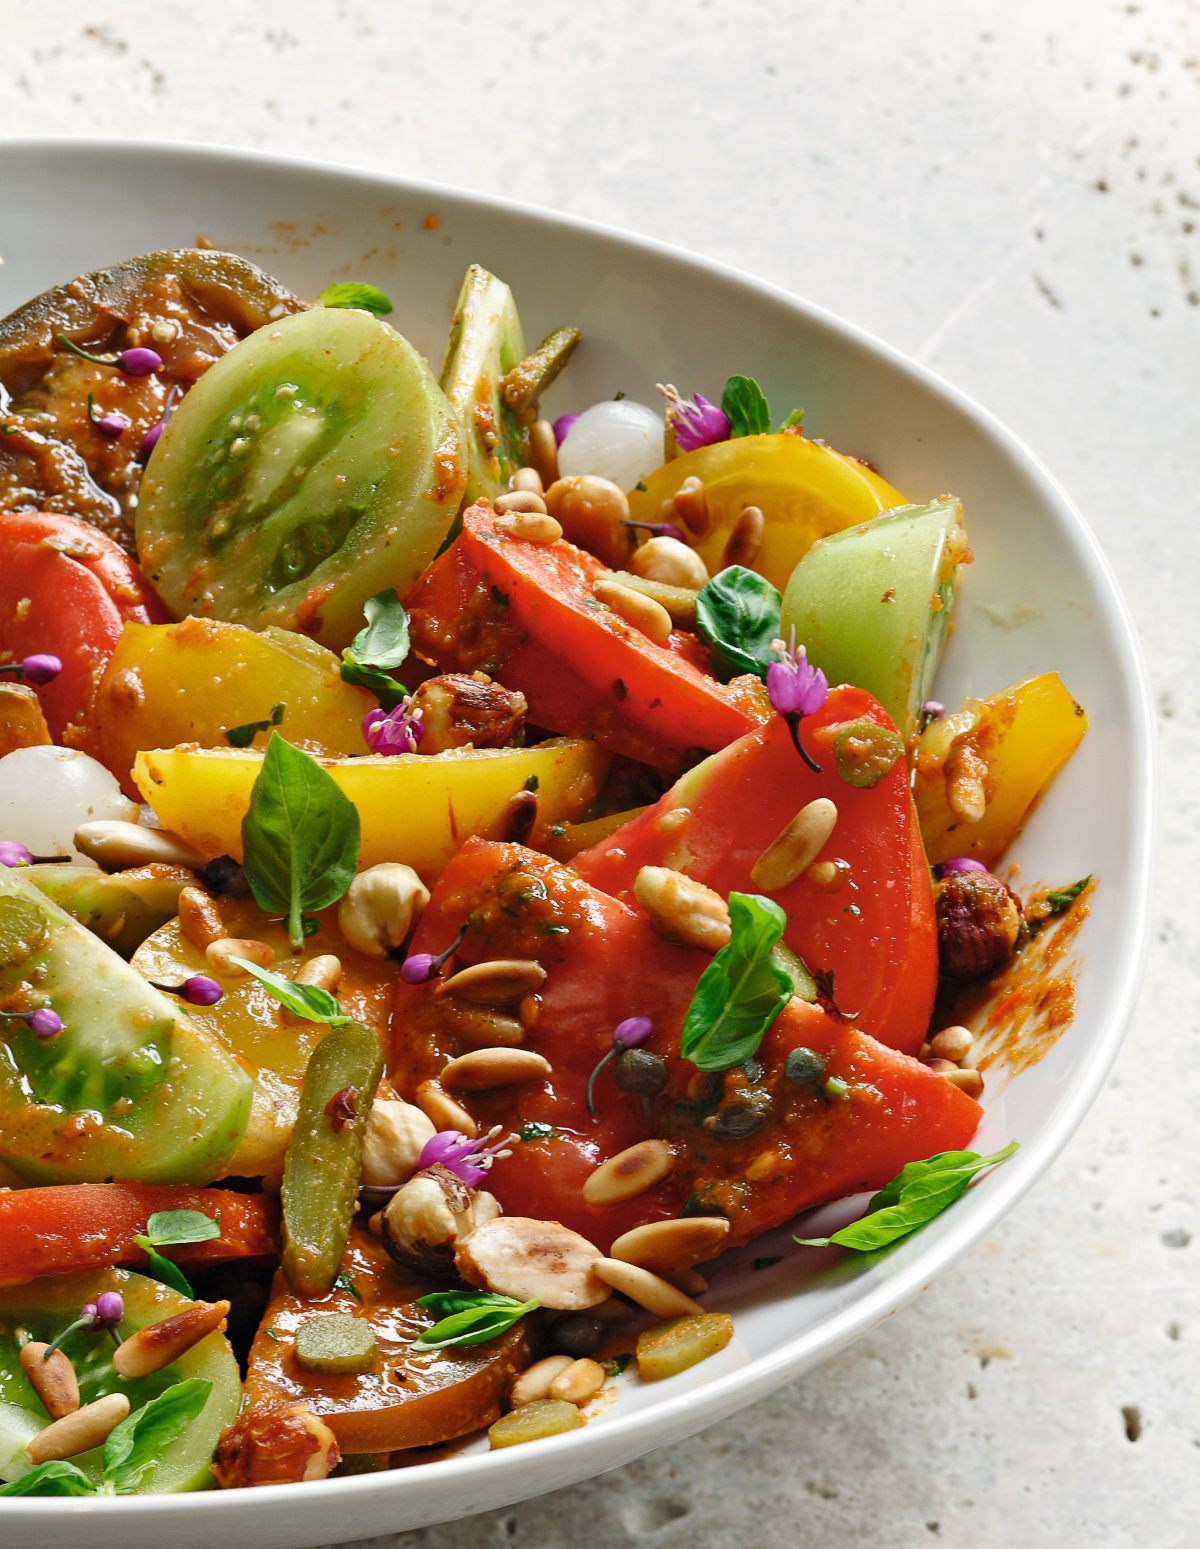 Salade de tomate, sauce romesco